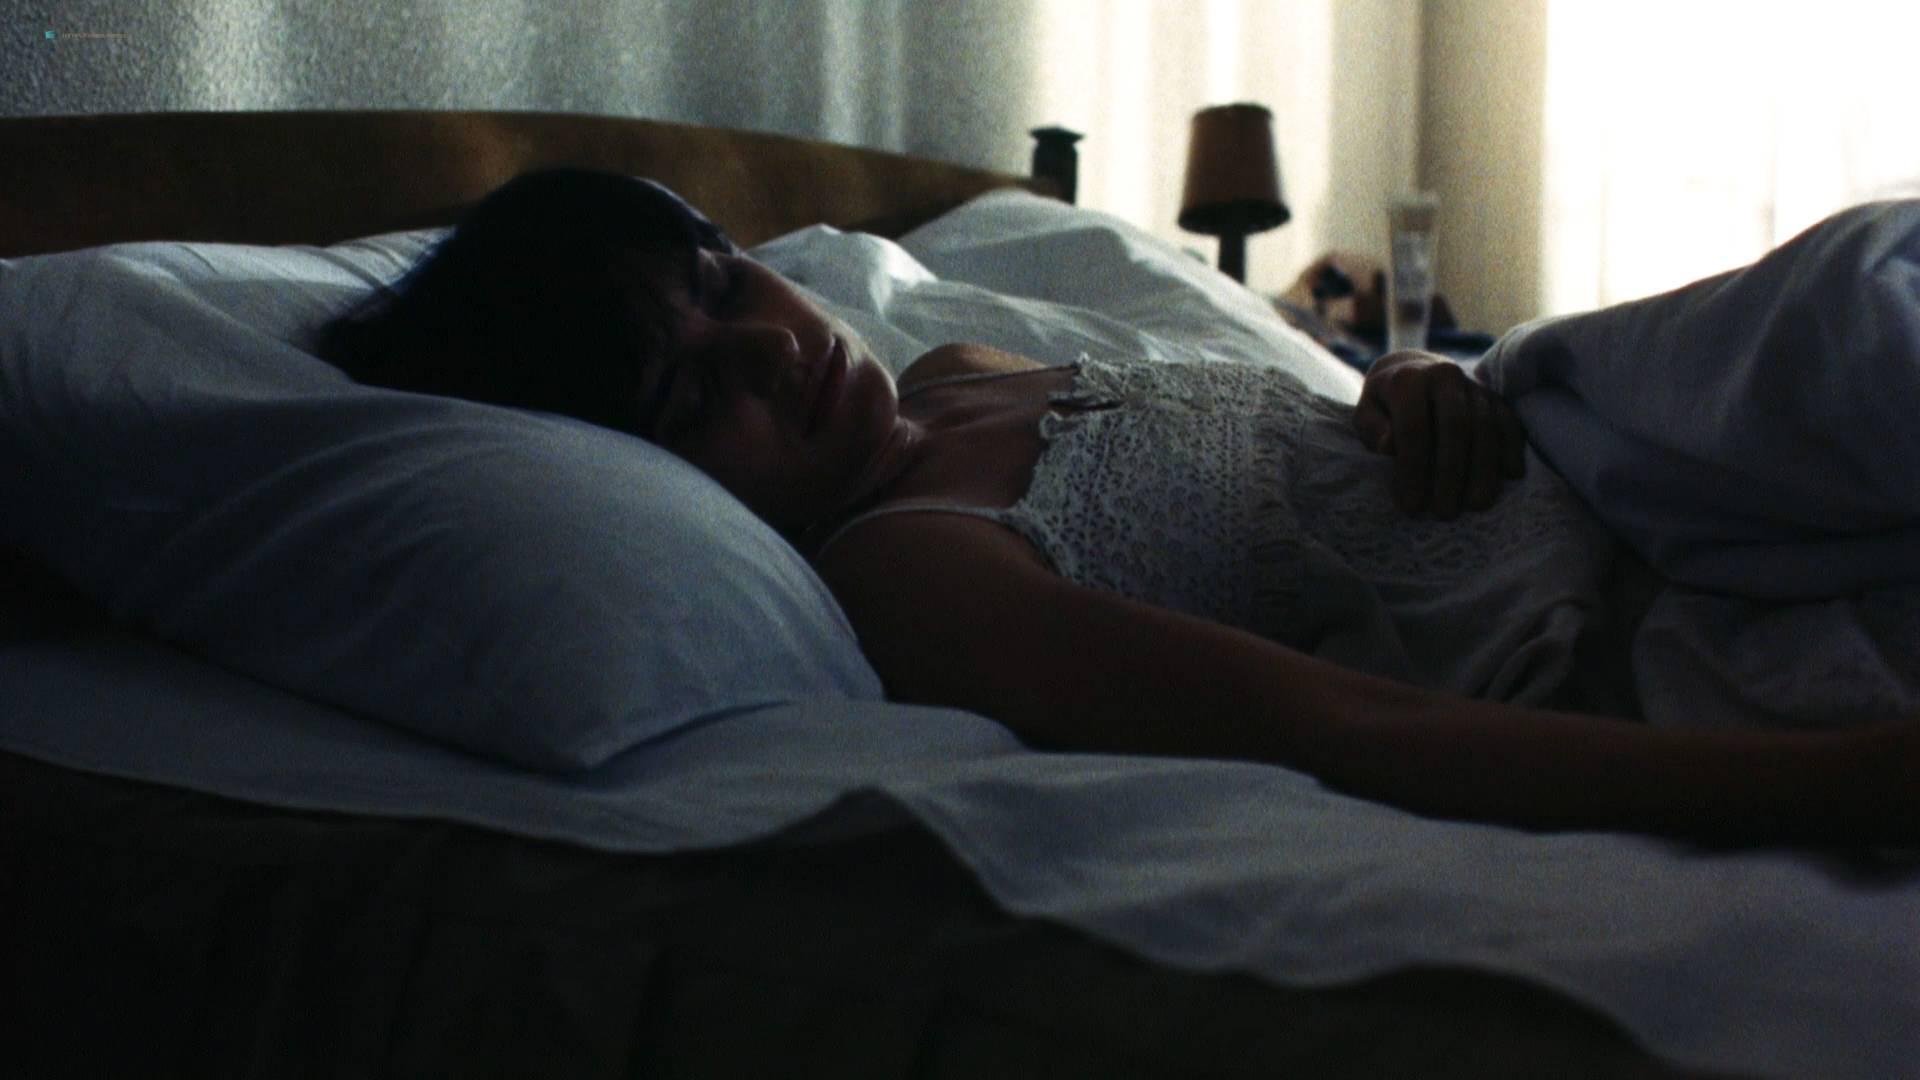 Denice Duff nude bush in the shower Melanie Shatner nude boobs - Bloodstone: Subspecies II (1993) HD 1080p BluRay (5)